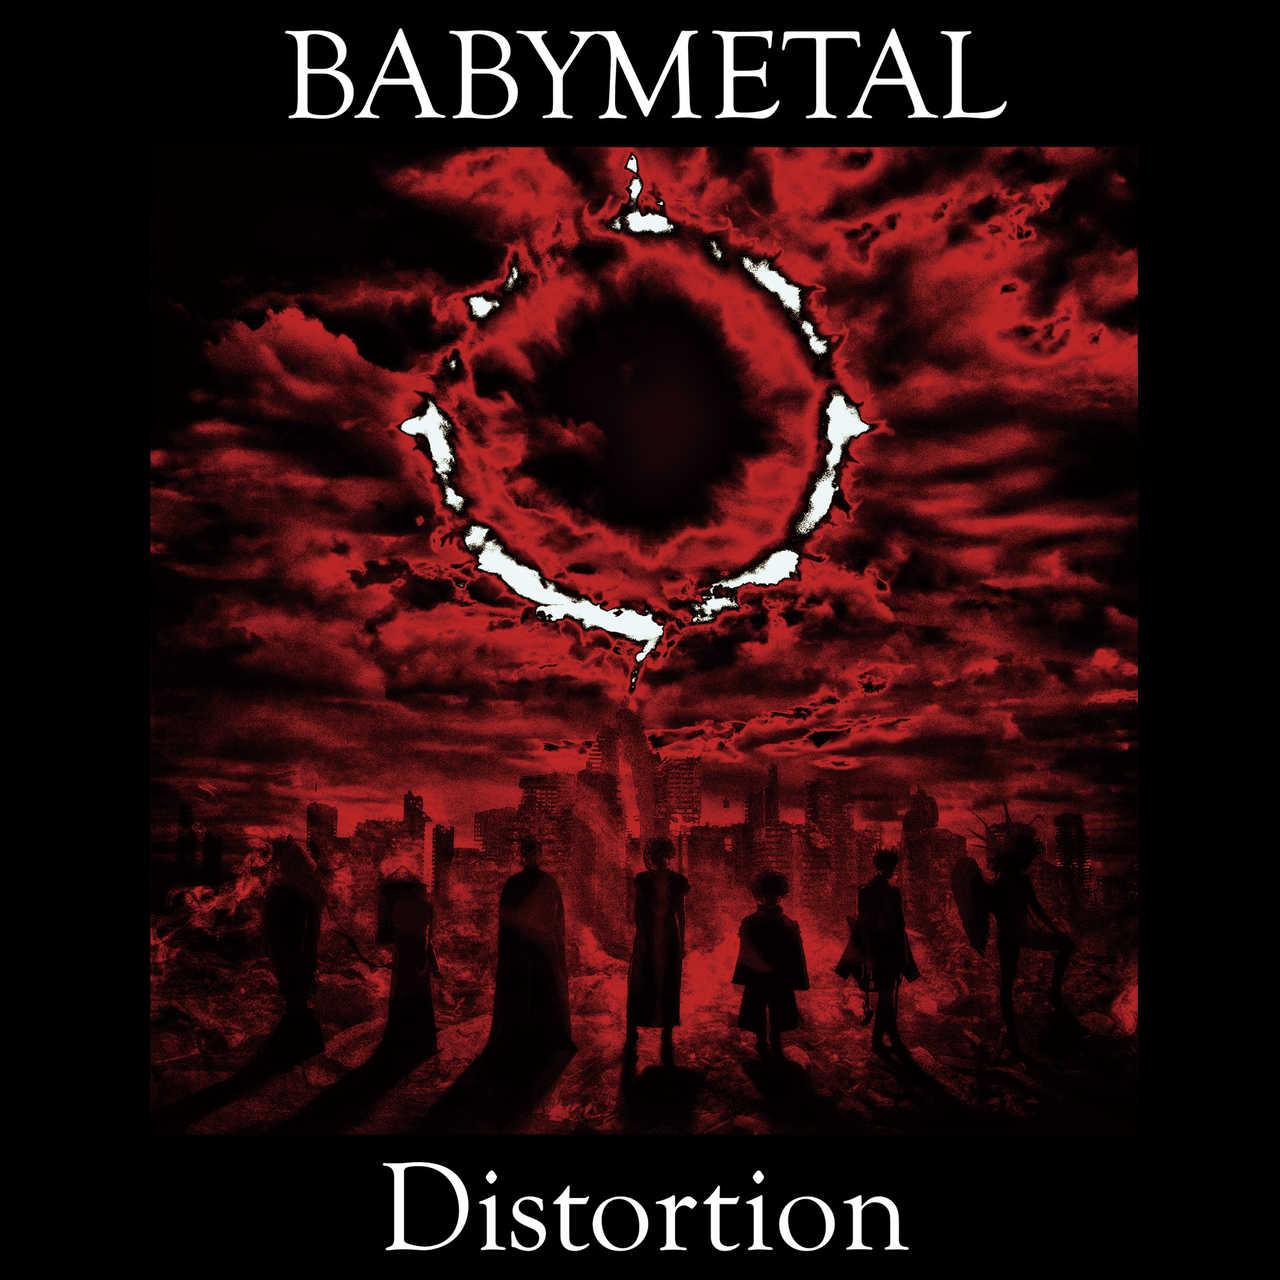 BABYMETAL「Distortion」最新ライブ映像を公開!アナログのリリースも決定!